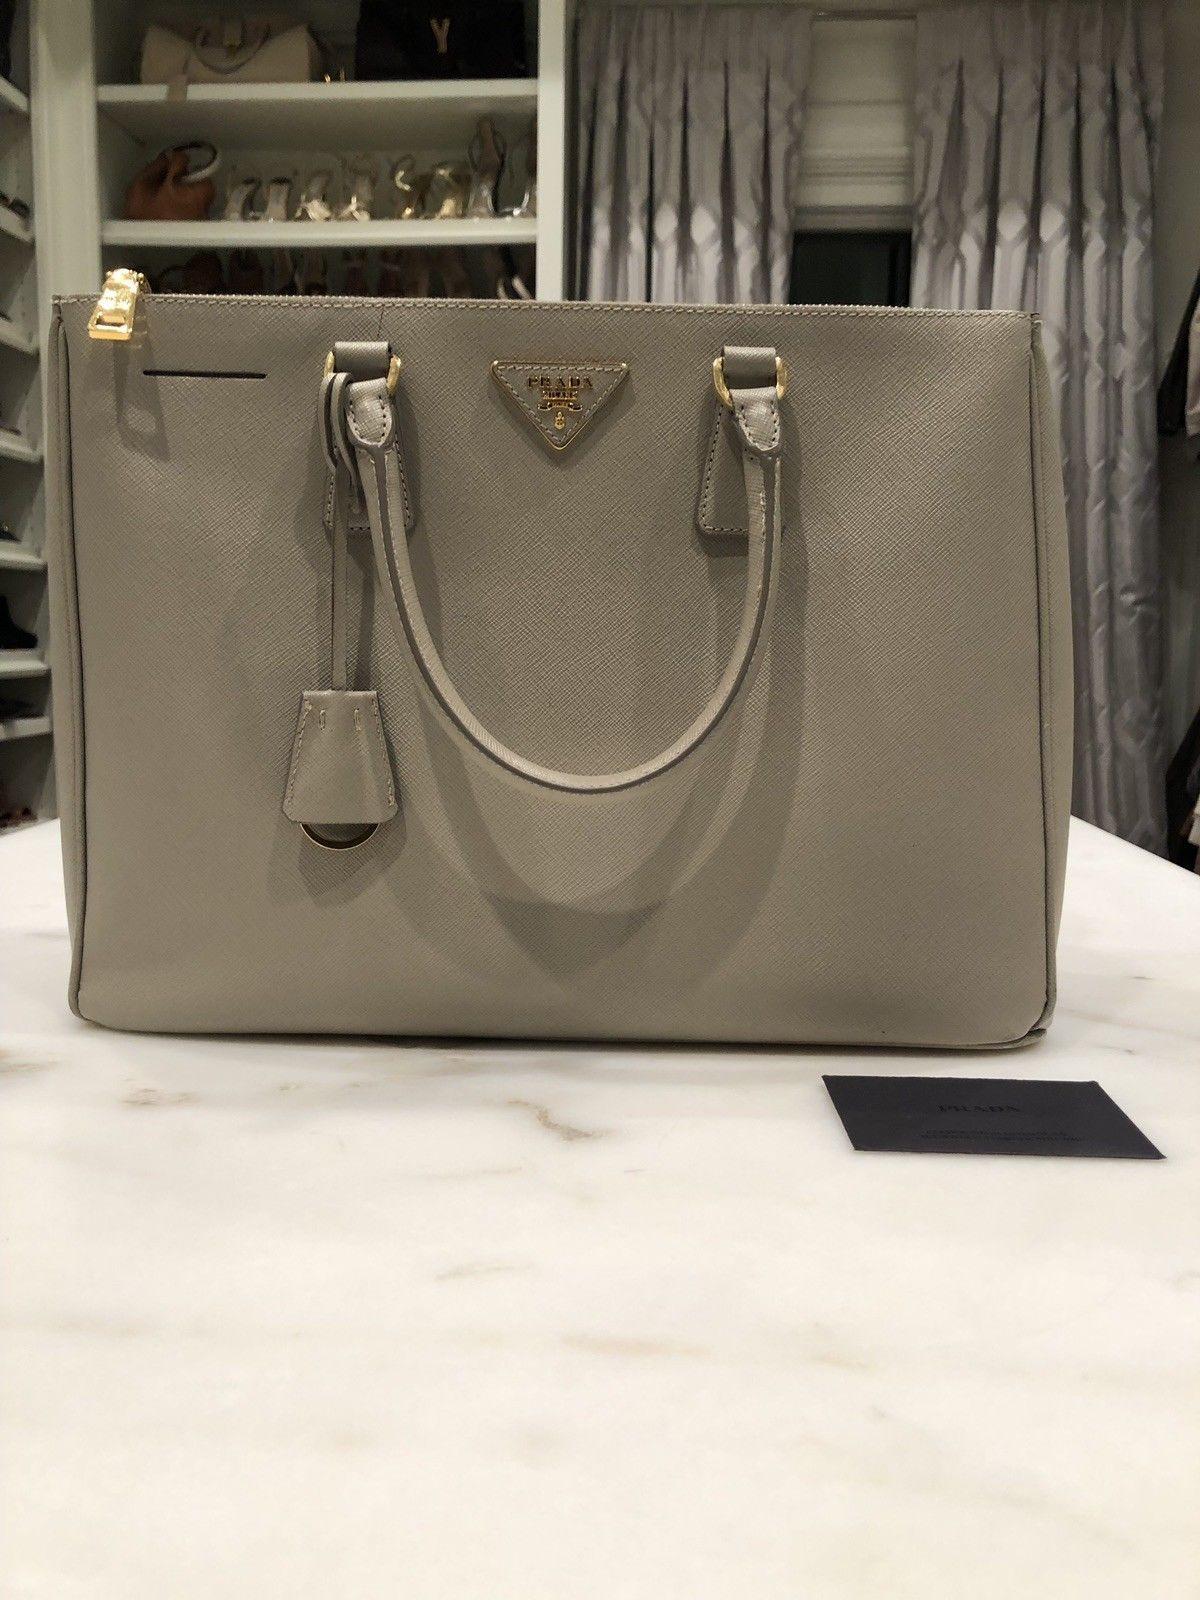 4d35ce3f0576 Authentic PRADA Argilla Saffiano Lux Leather Tote Shoulder Hand Bag Grey  Gray  356.0